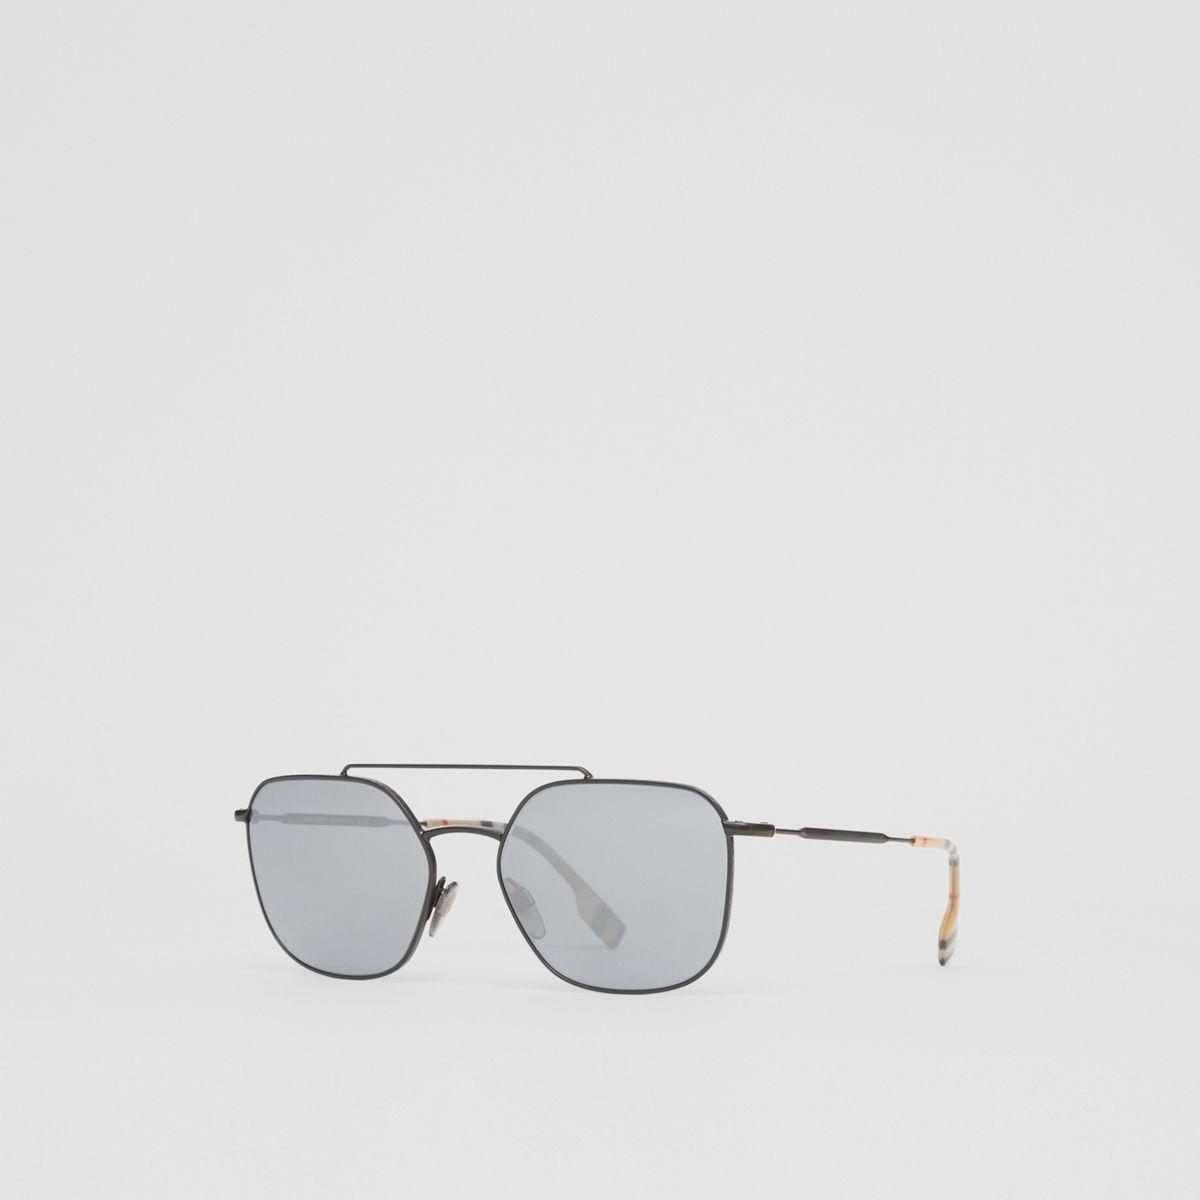 8354f20102e Burberry - Multicolor Top Bar Detail Square Pilot Sunglasses for Men - Lyst.  View fullscreen